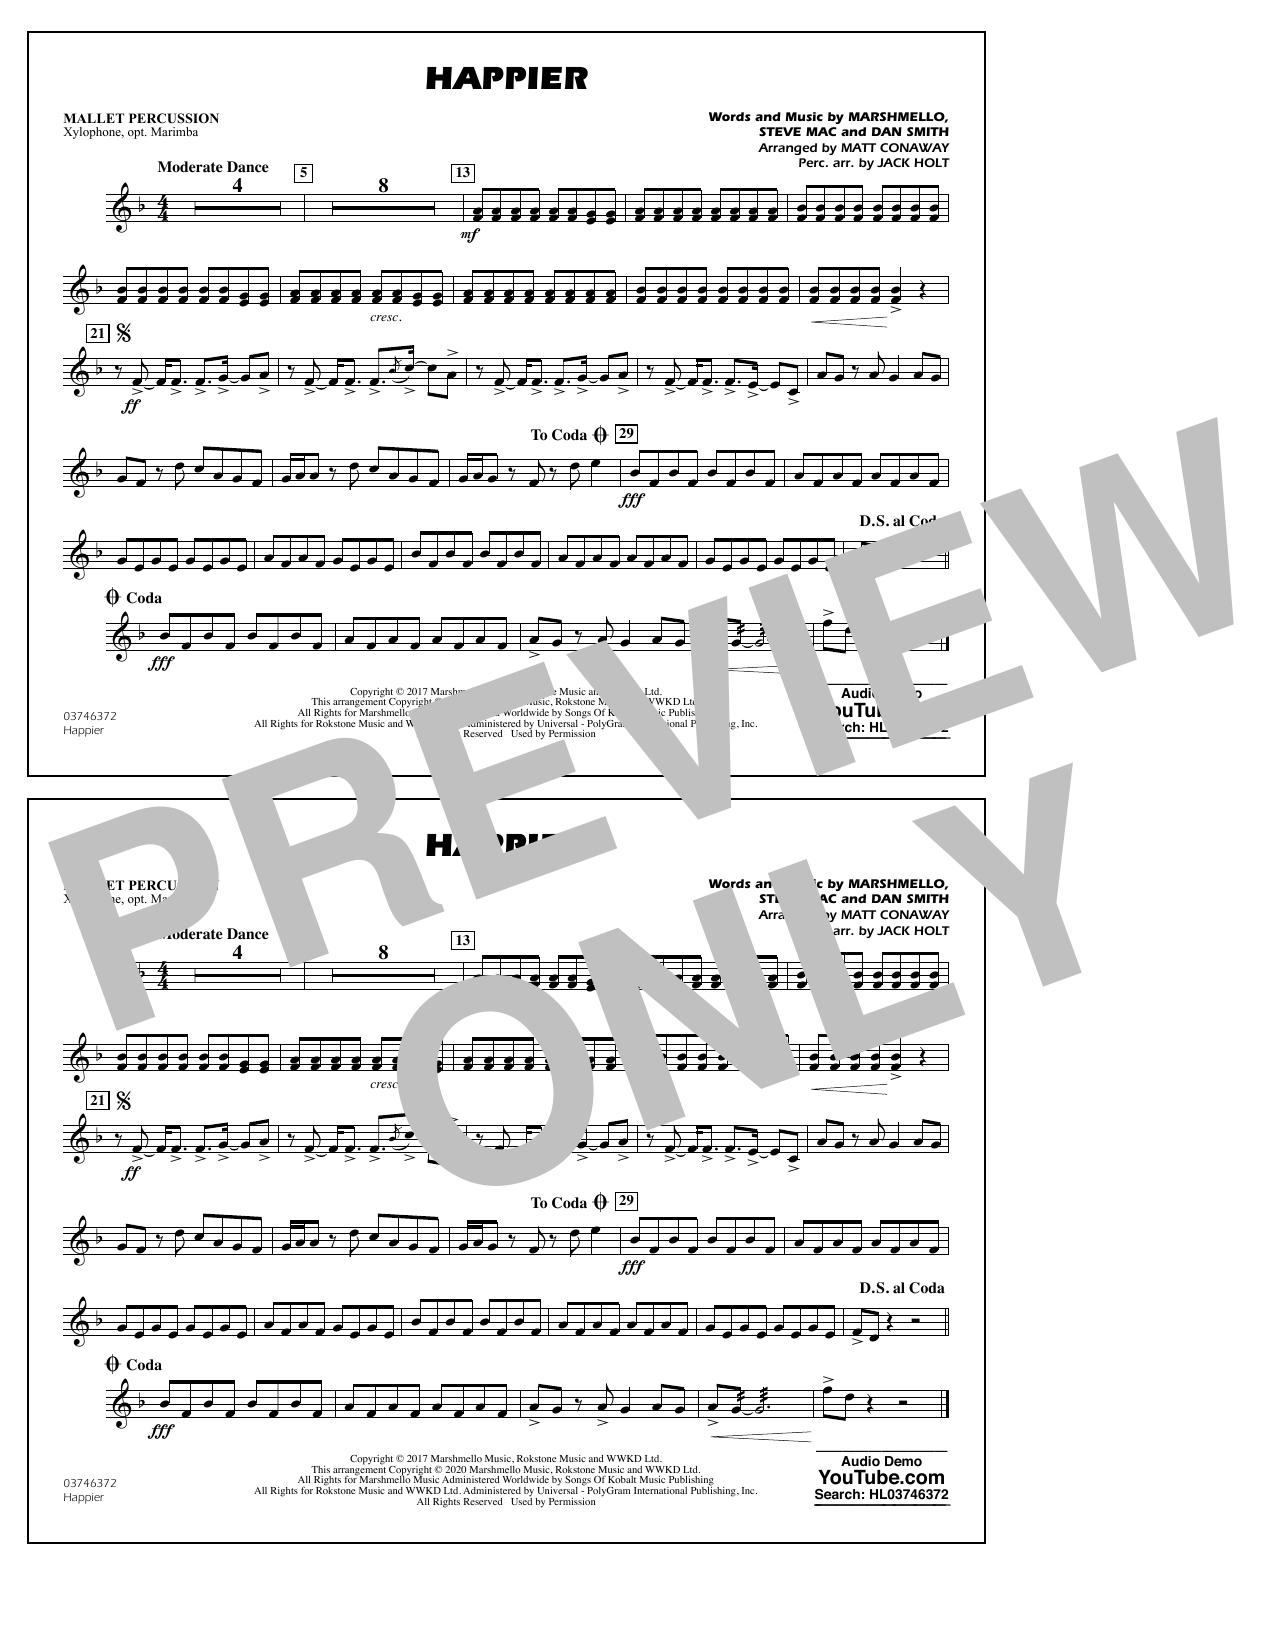 Happier (arr. Matt Conaway and Jack Holt) - Mallet Percussion Sheet Music